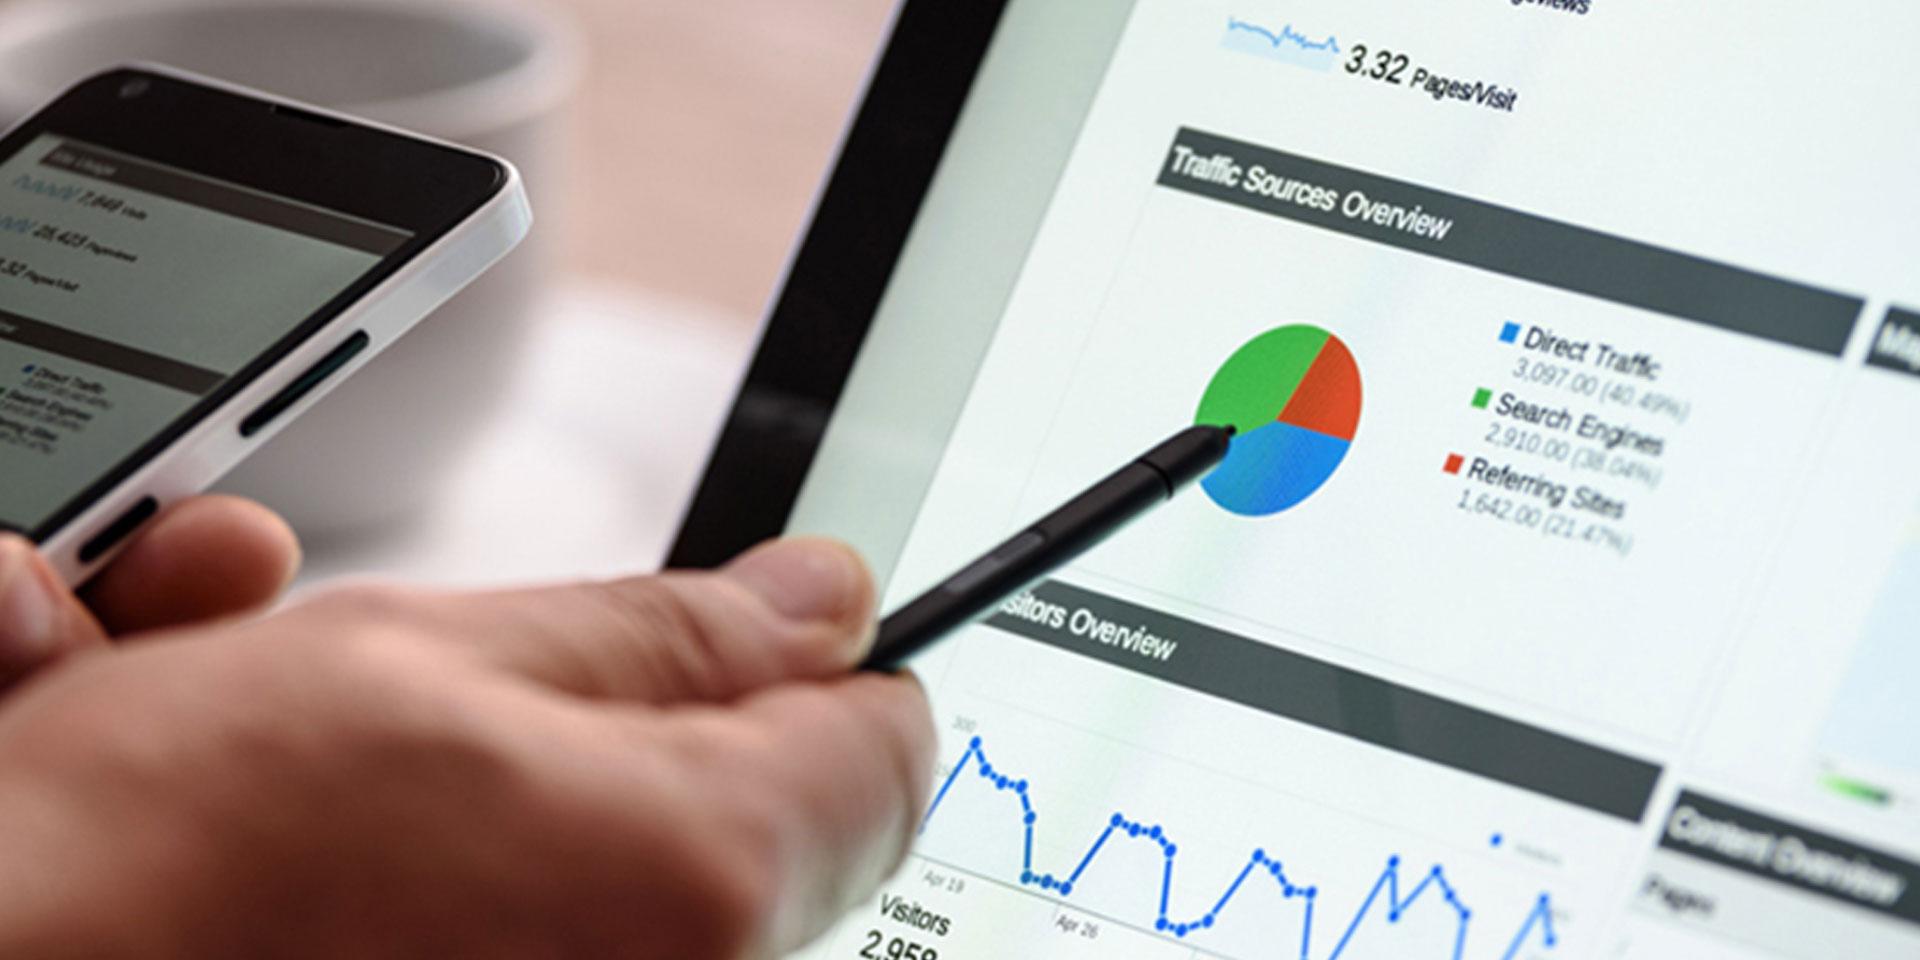 SEO insights help inform PR activity for Arvia